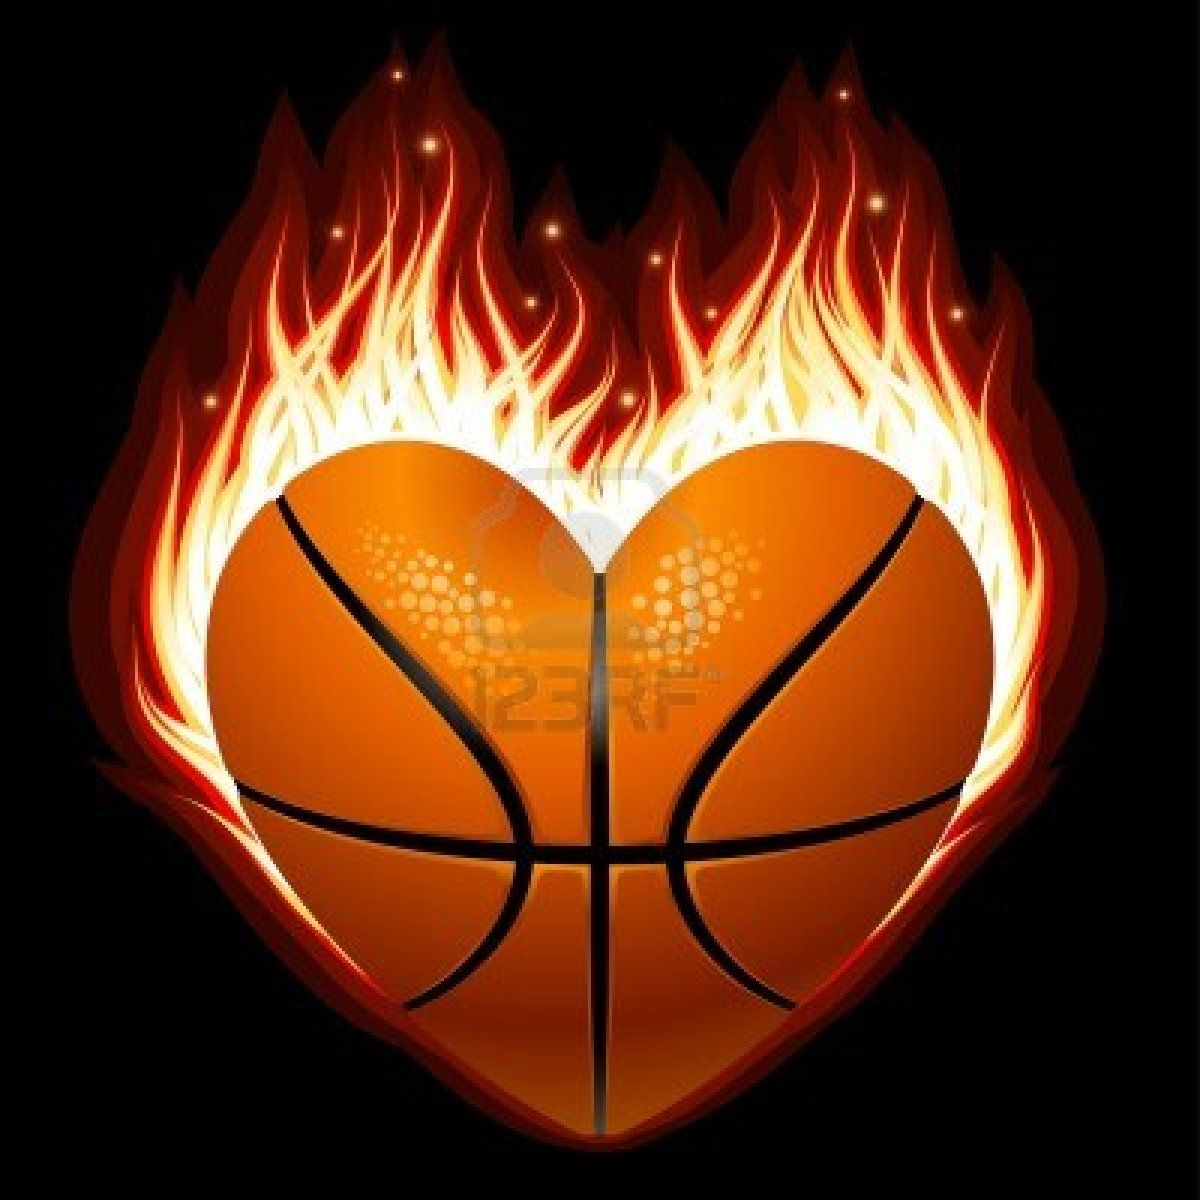 Hoops for heart hd wallpaper basketball basketball - Basketball wallpapers for girls ...